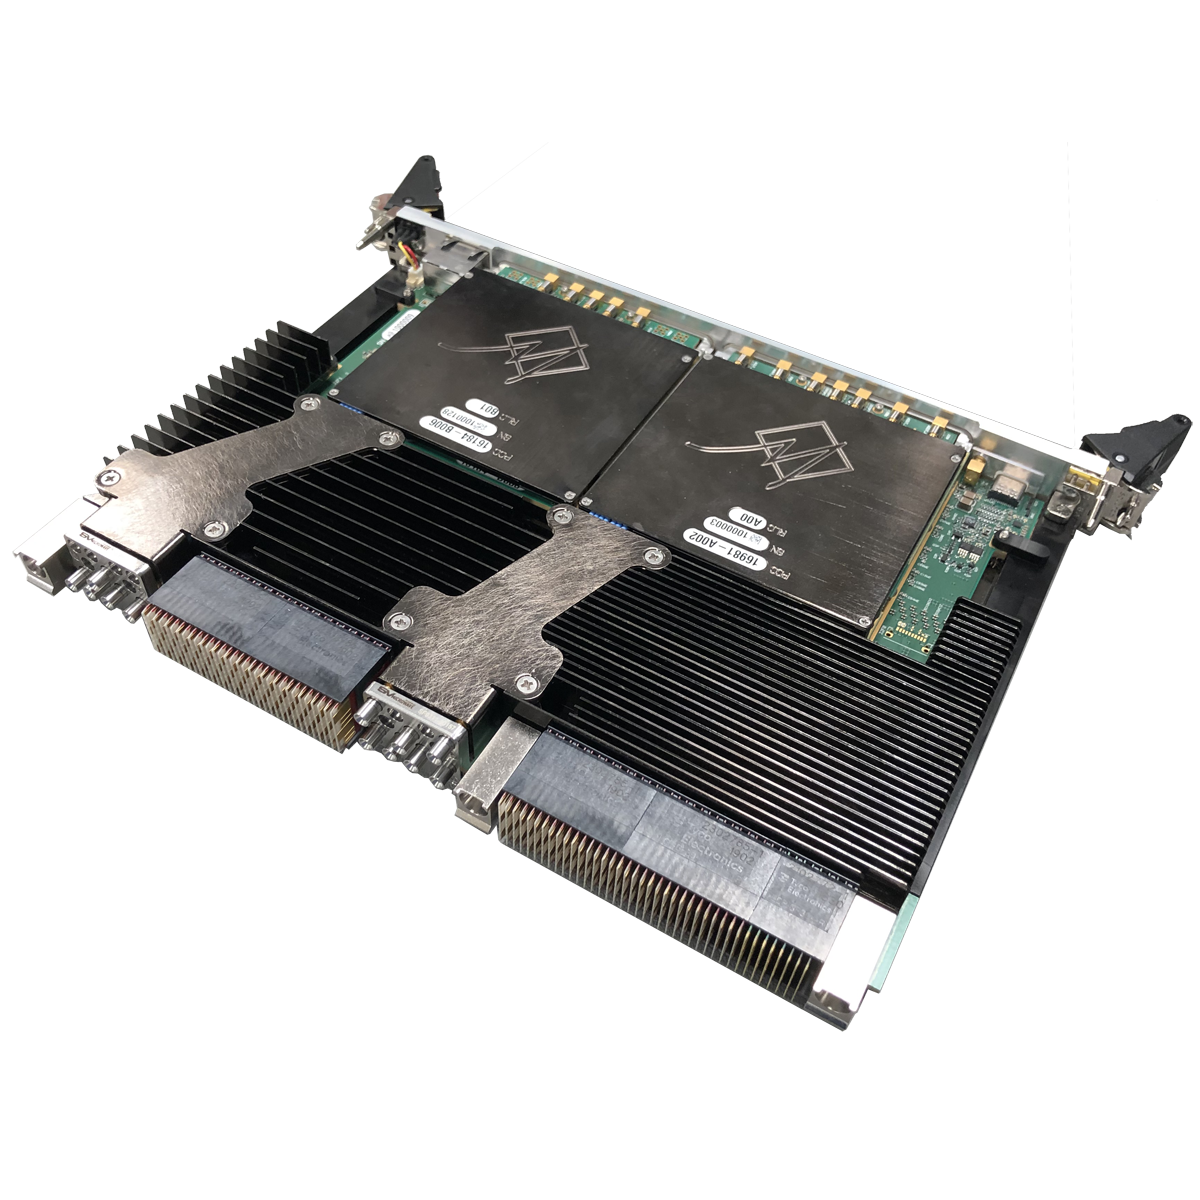 Xilinx Virtex UltraScale+ FPGA Board with Zynq Quad ARM CPU - 6XB2